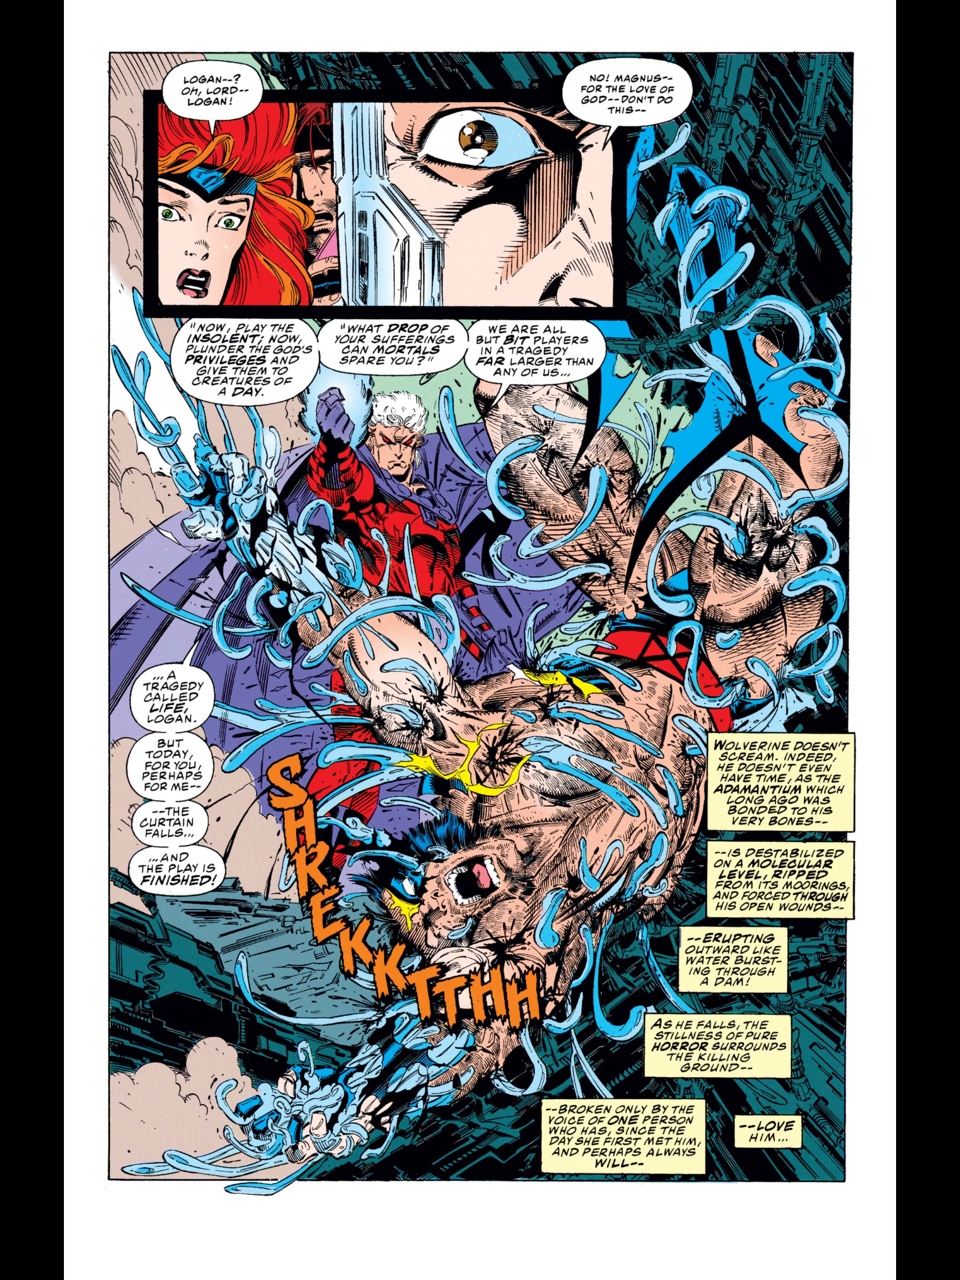 X-Men (1991) #25 by Fabian Nicieza and Andy Kubert. Magneto removes Wolverine's adamantium